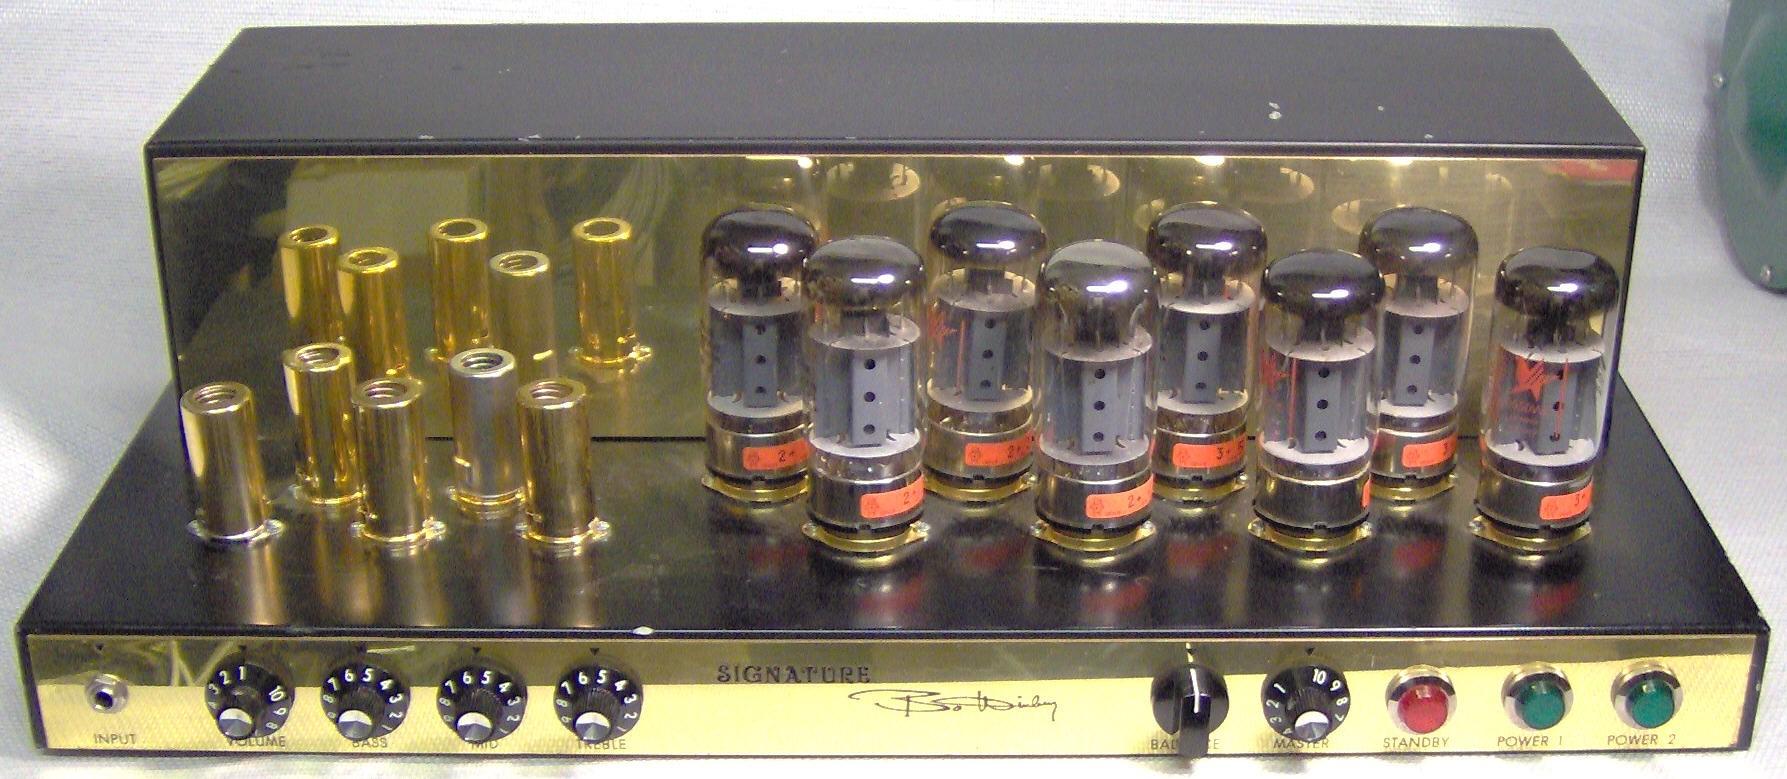 Bo Winberg amp, a.jpg